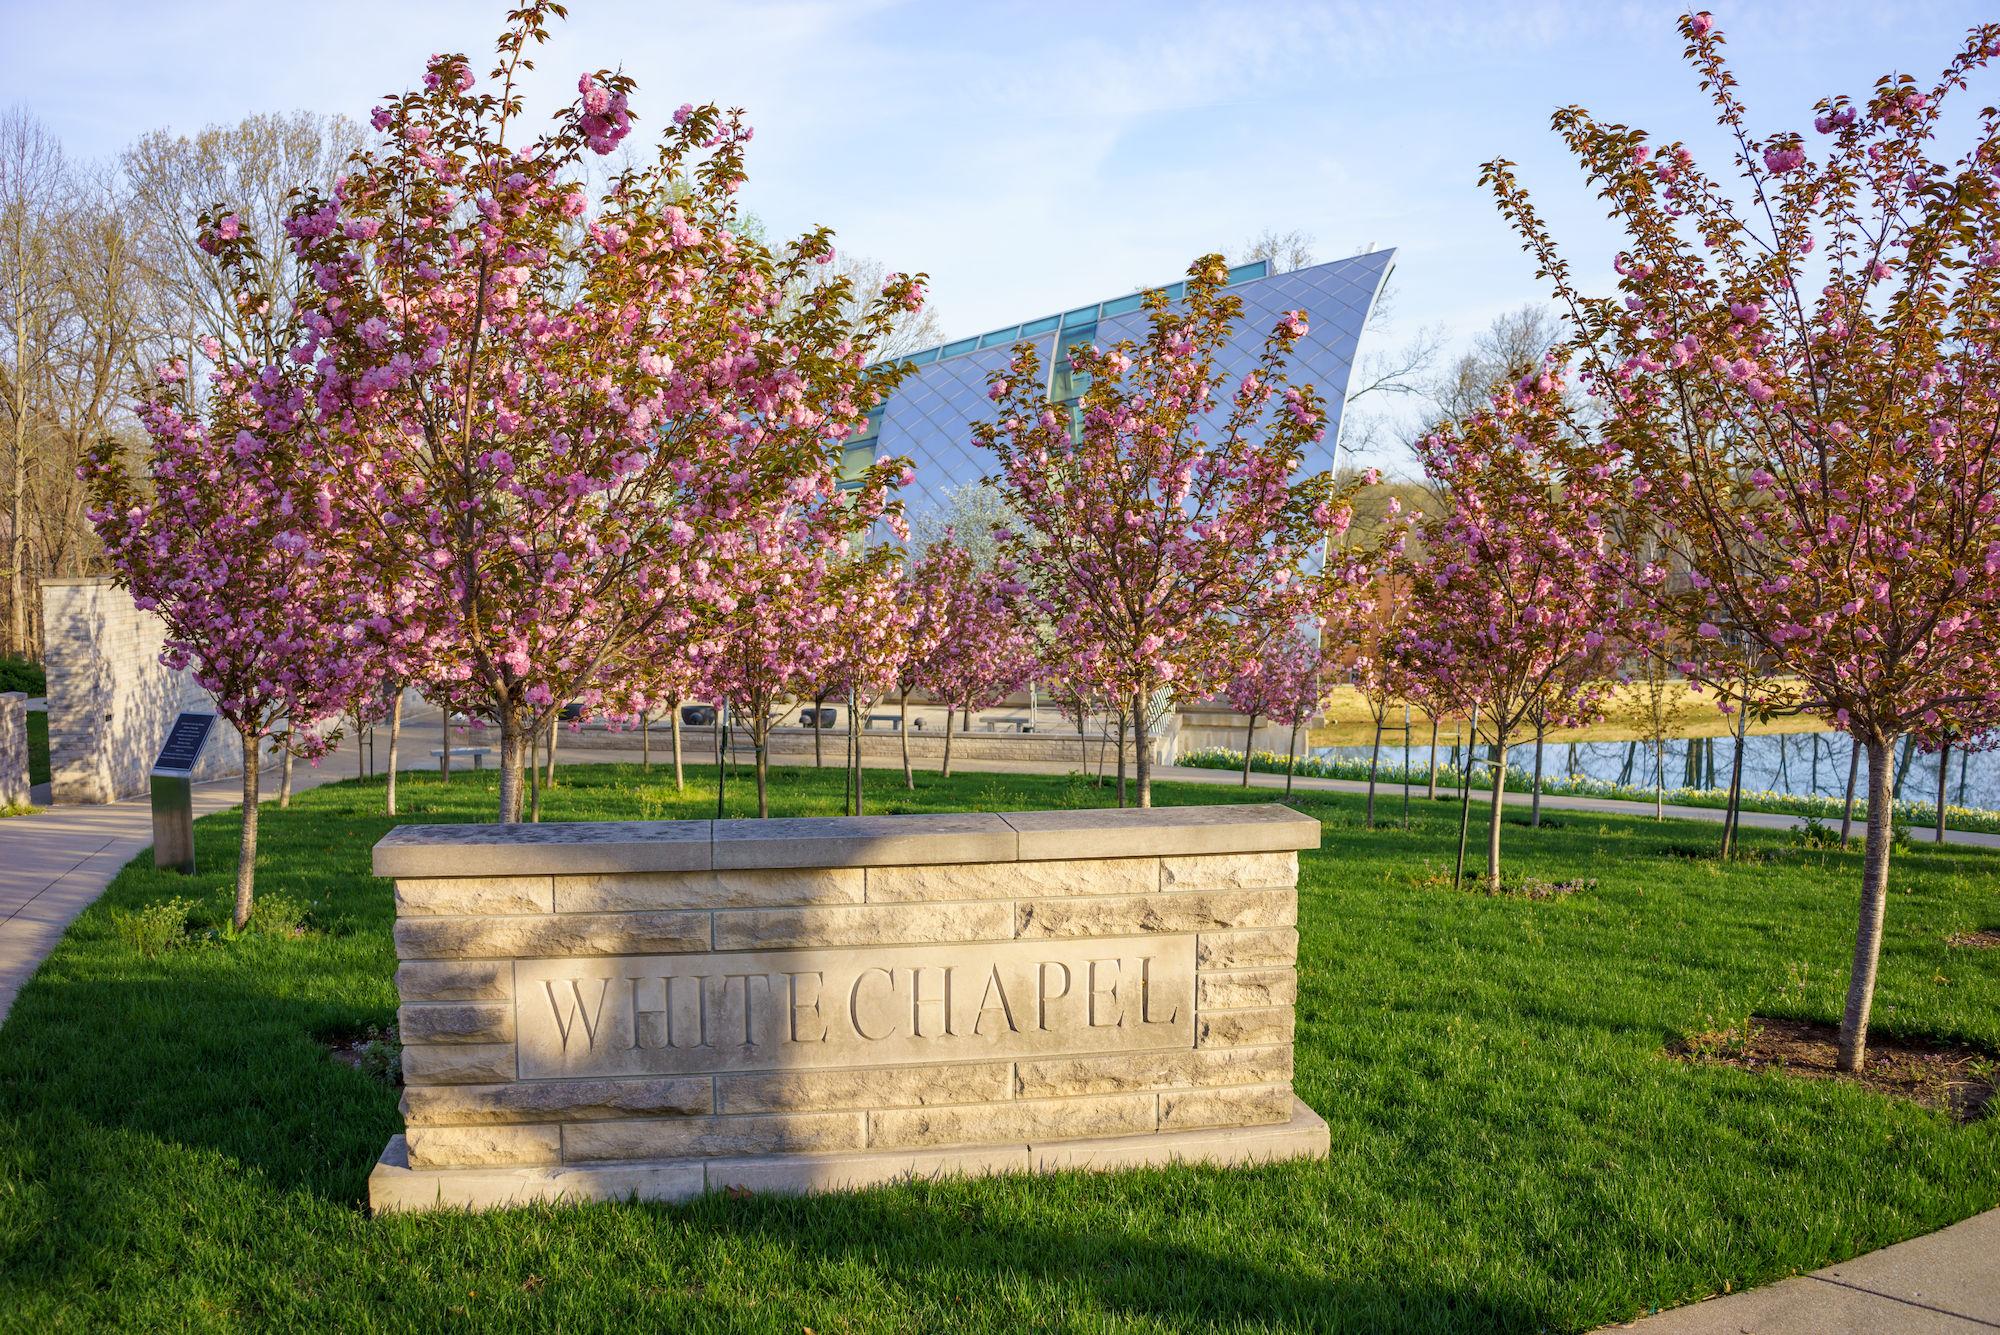 RHIT_Campus_White_Chapel_Cherry_Blossoms-2624.jpg